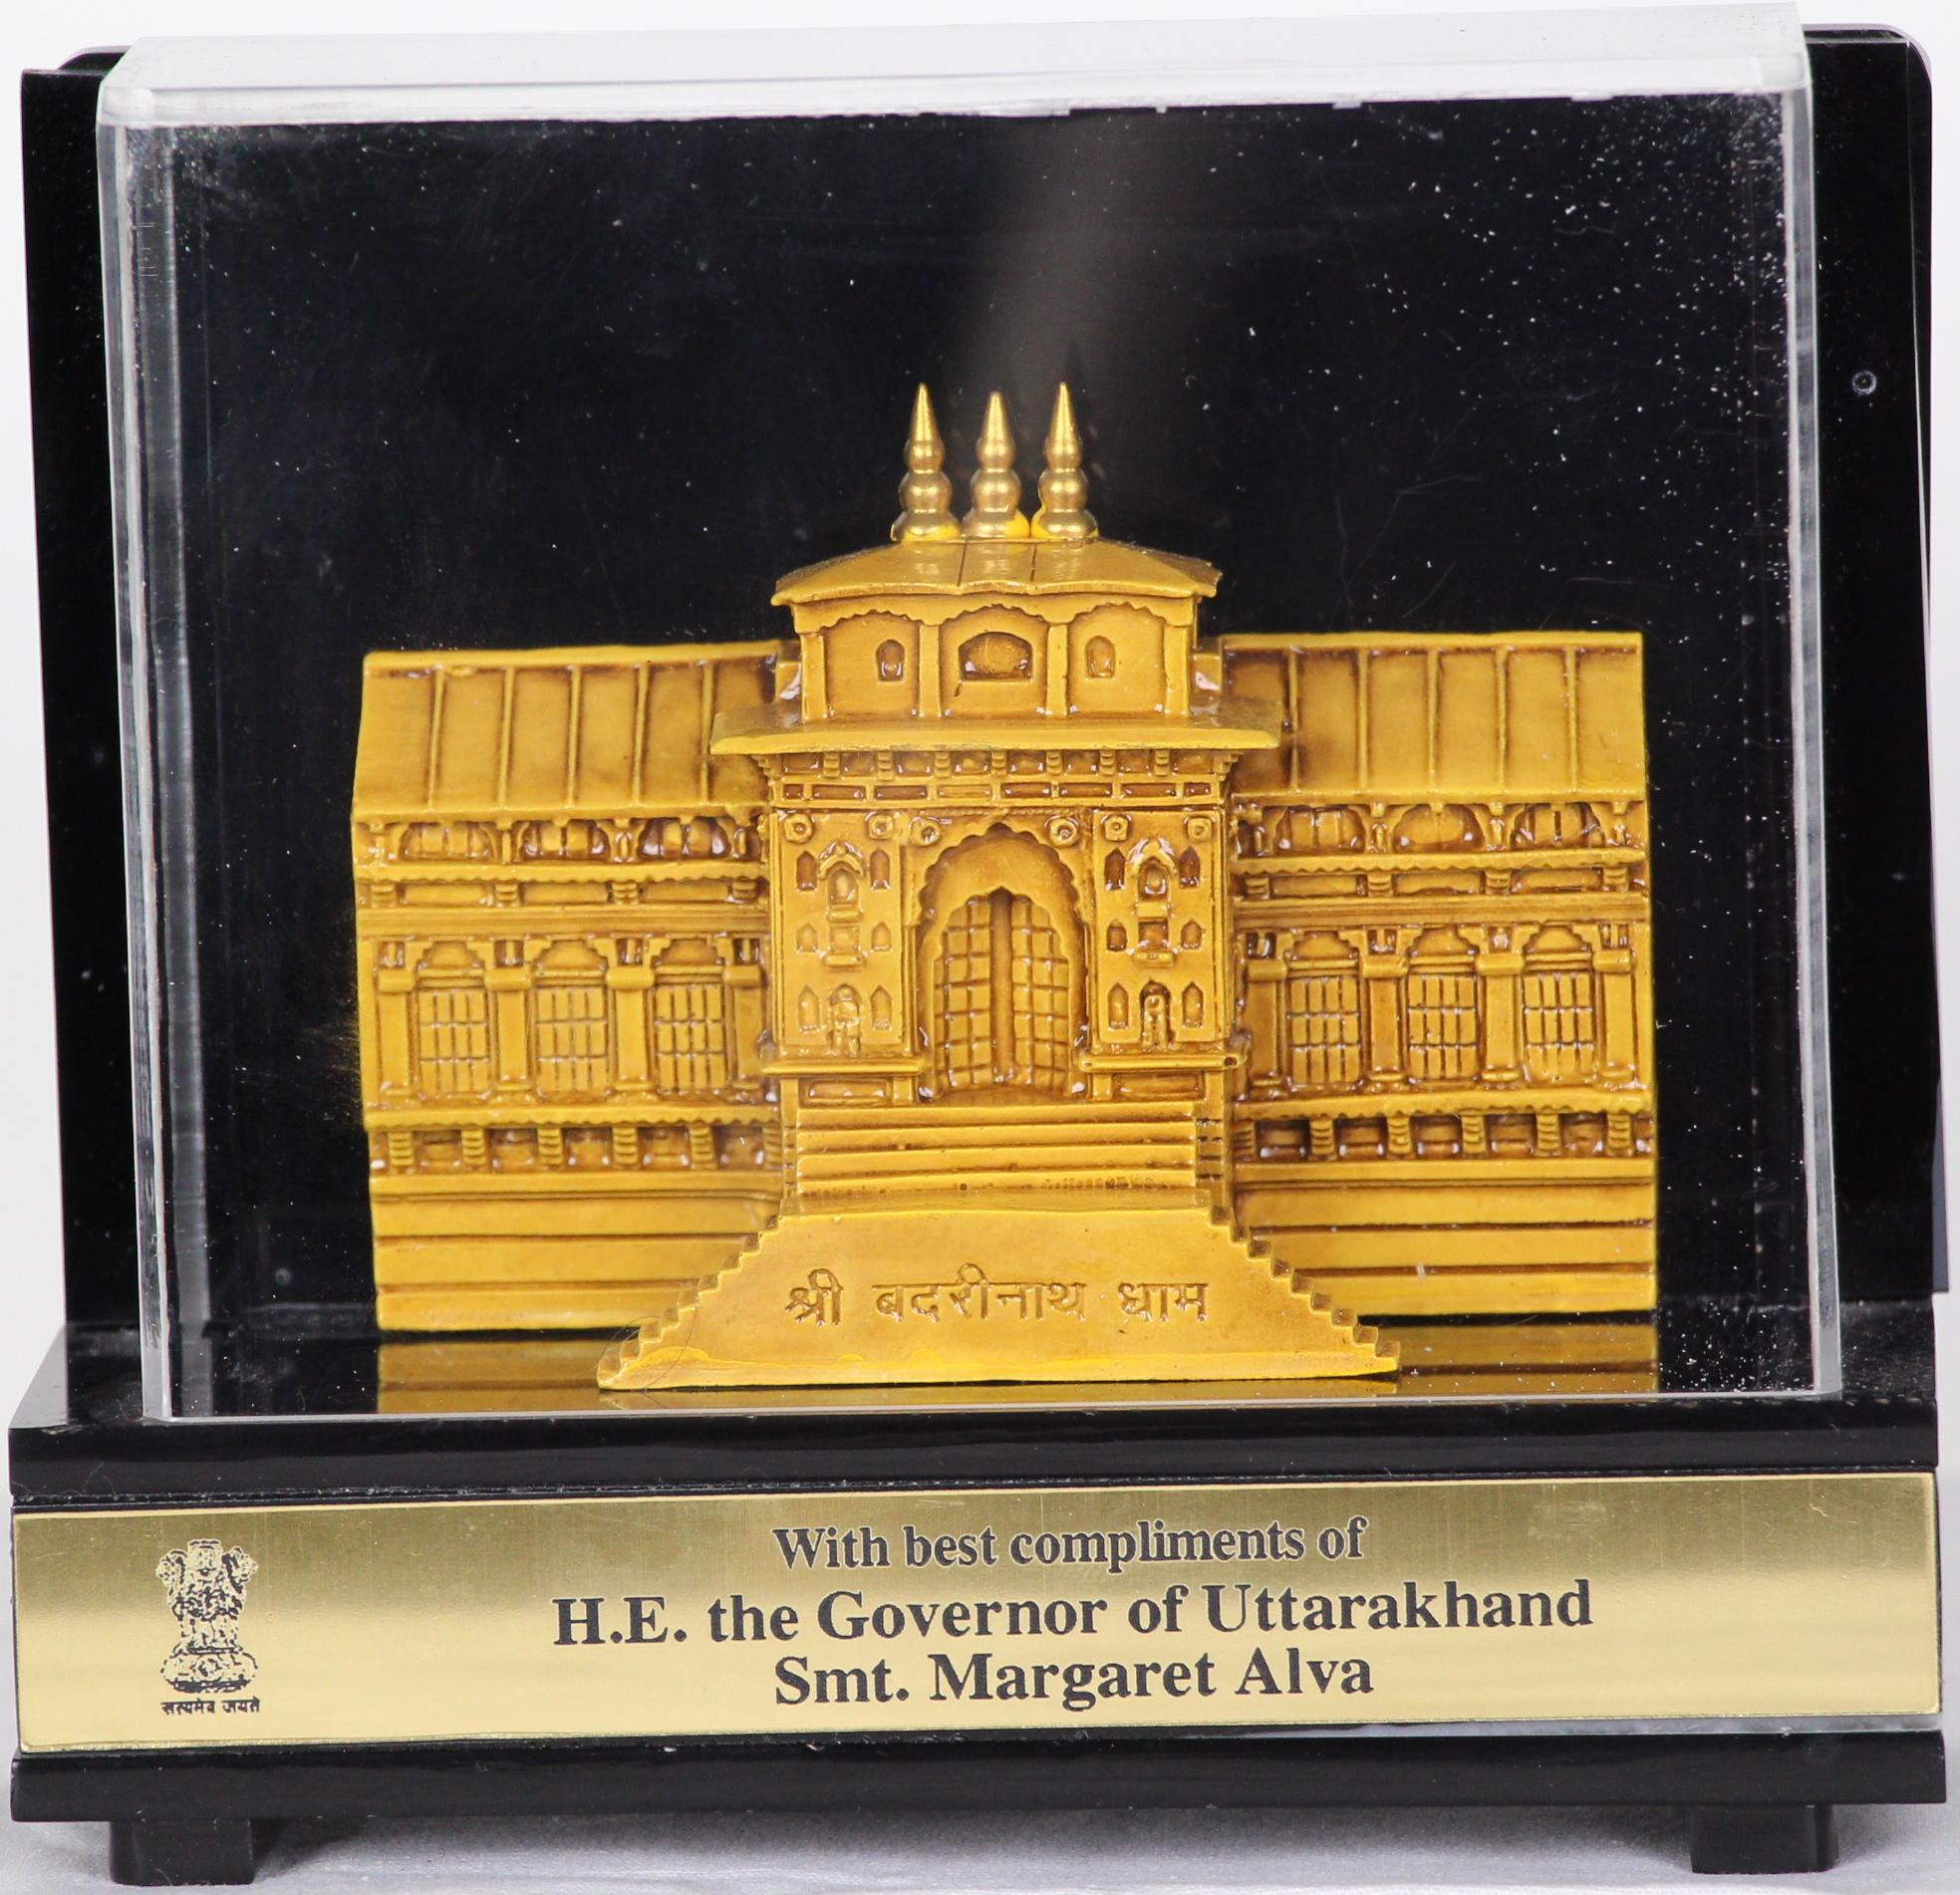 Award of Appreciation from H. E. the Governor of Uttarakhand, Smt. Margaret Alva